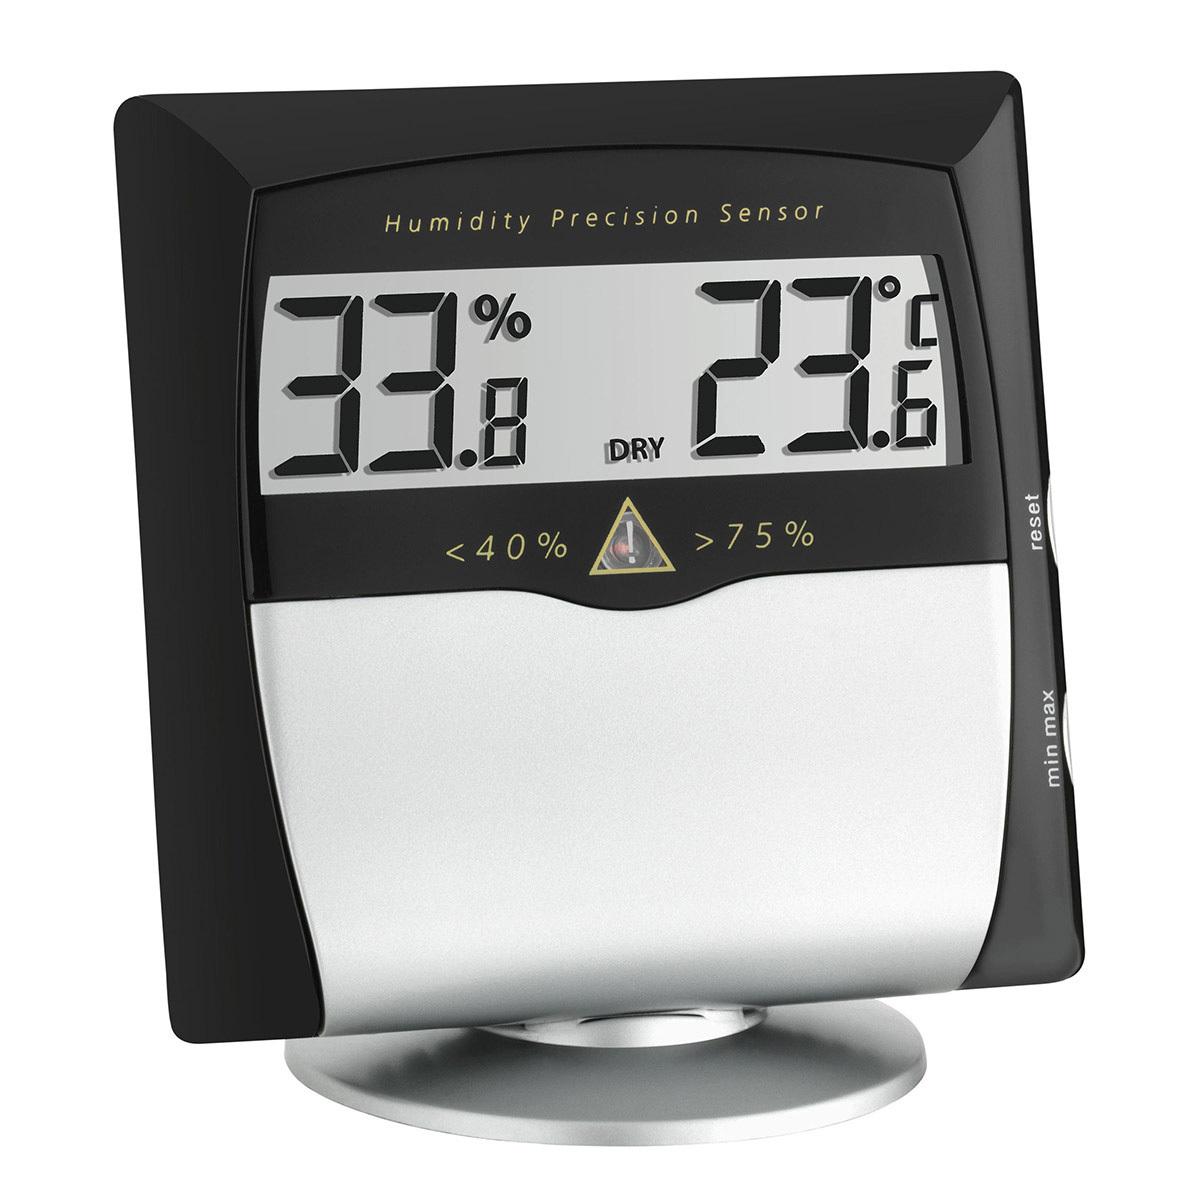 30-5009-digitales-thermo-hygrometer-musicontrol-ansicht-1200x1200px.jpg